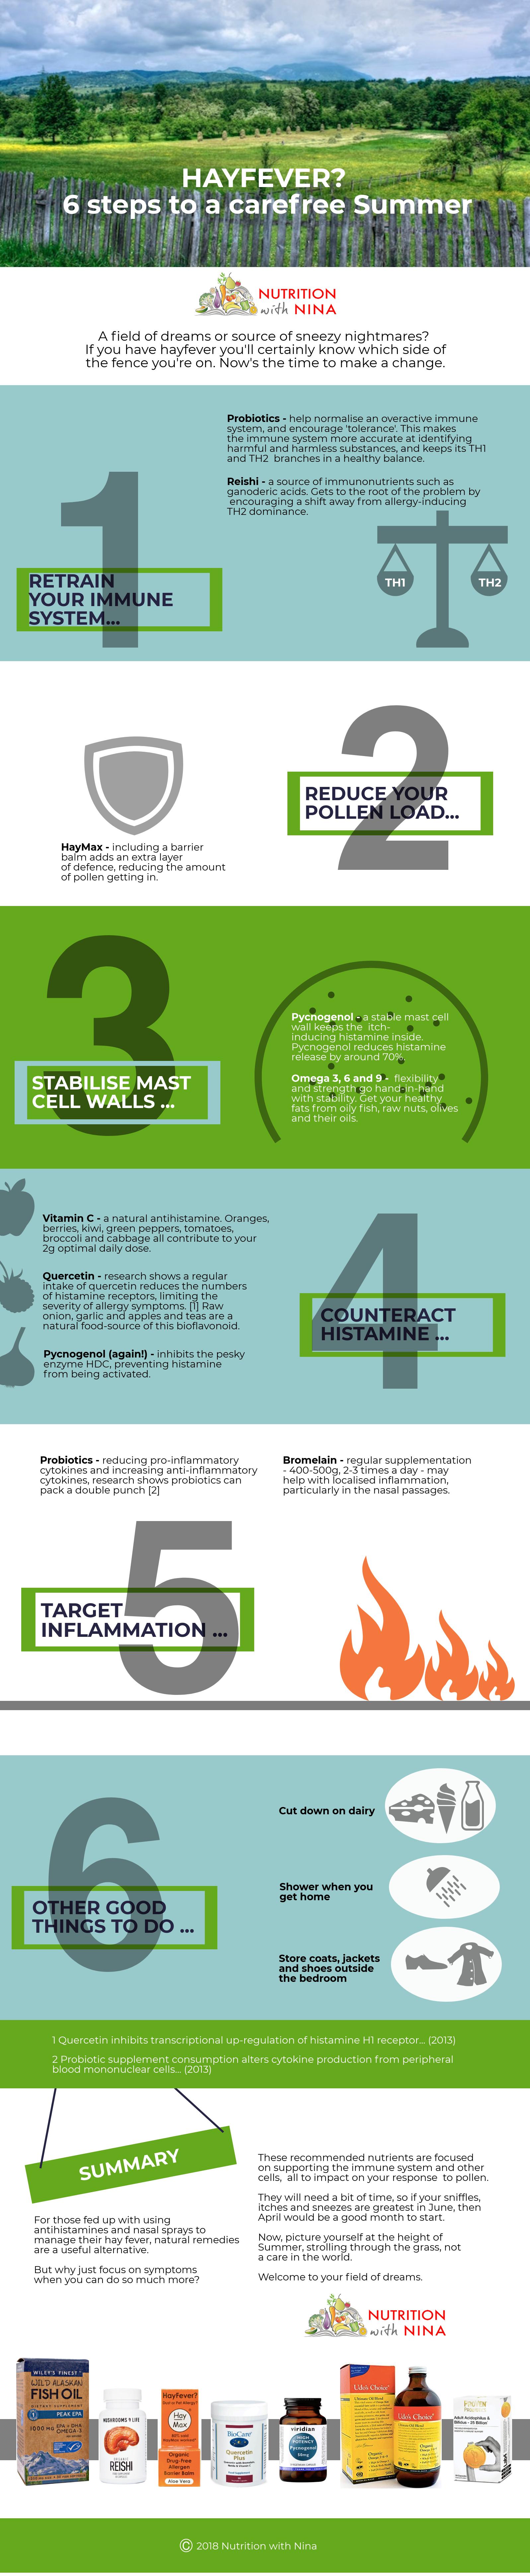 Infographic on Hayfever